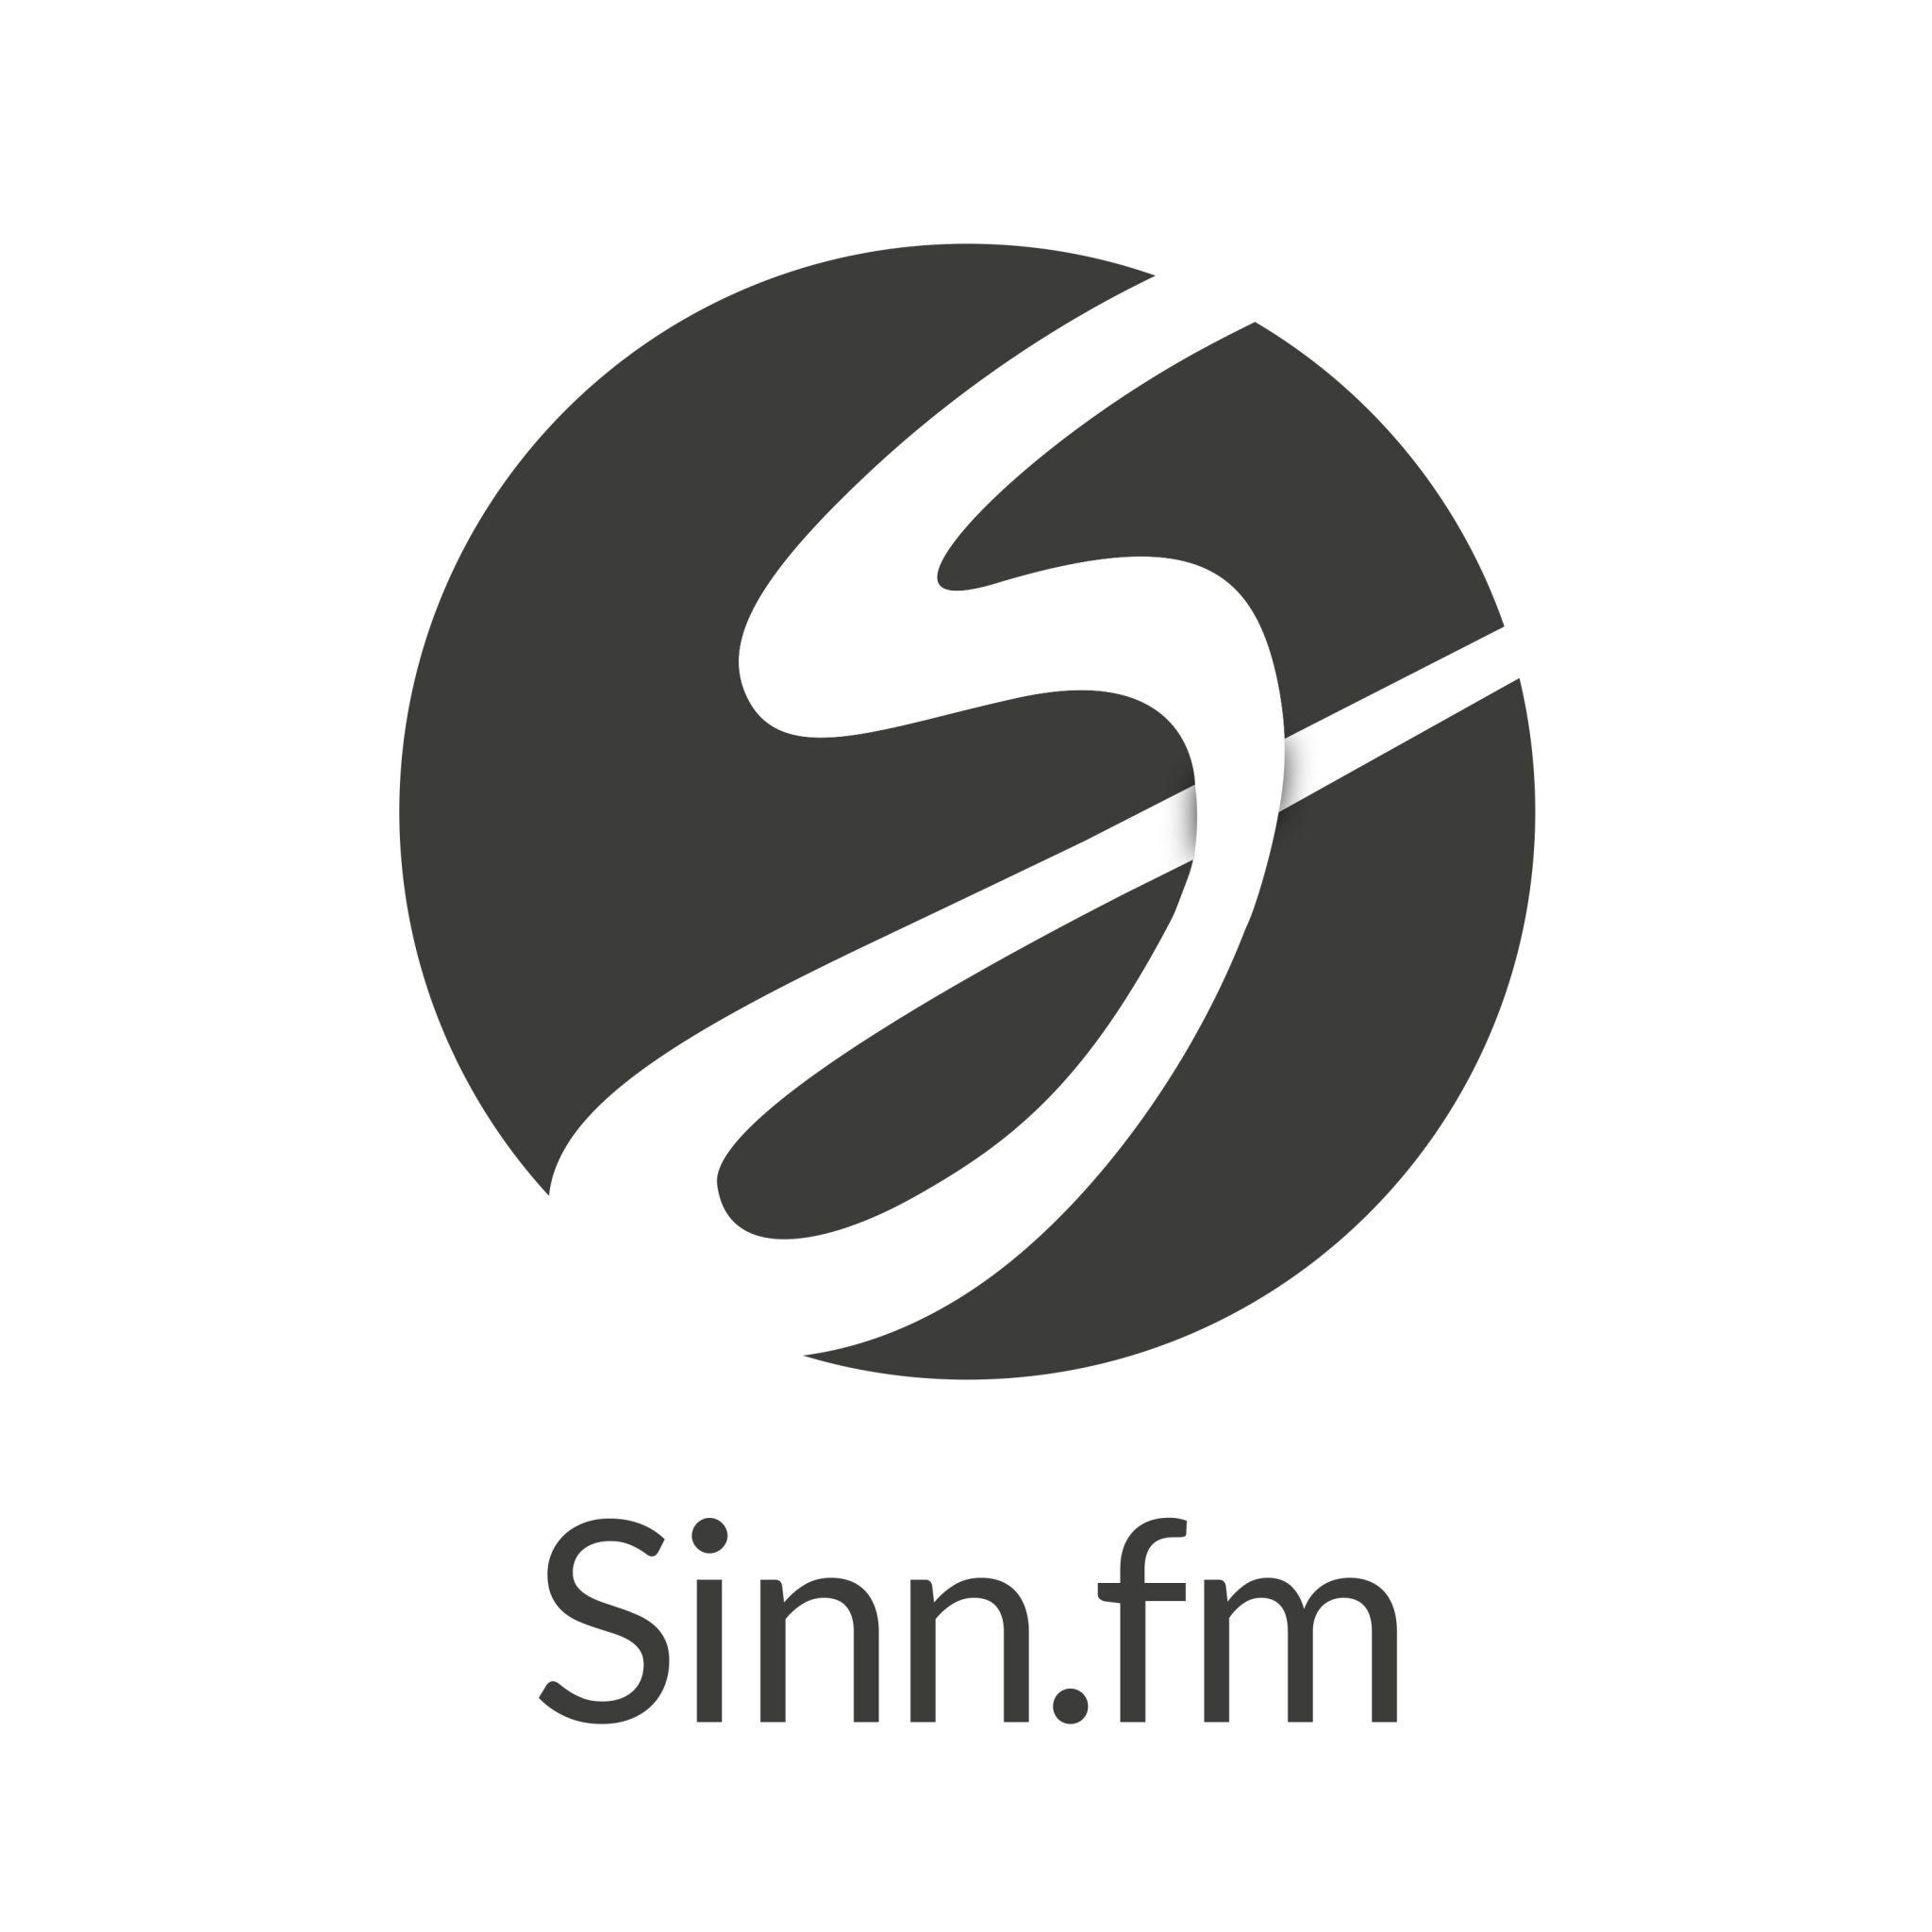 sinn.fm logo